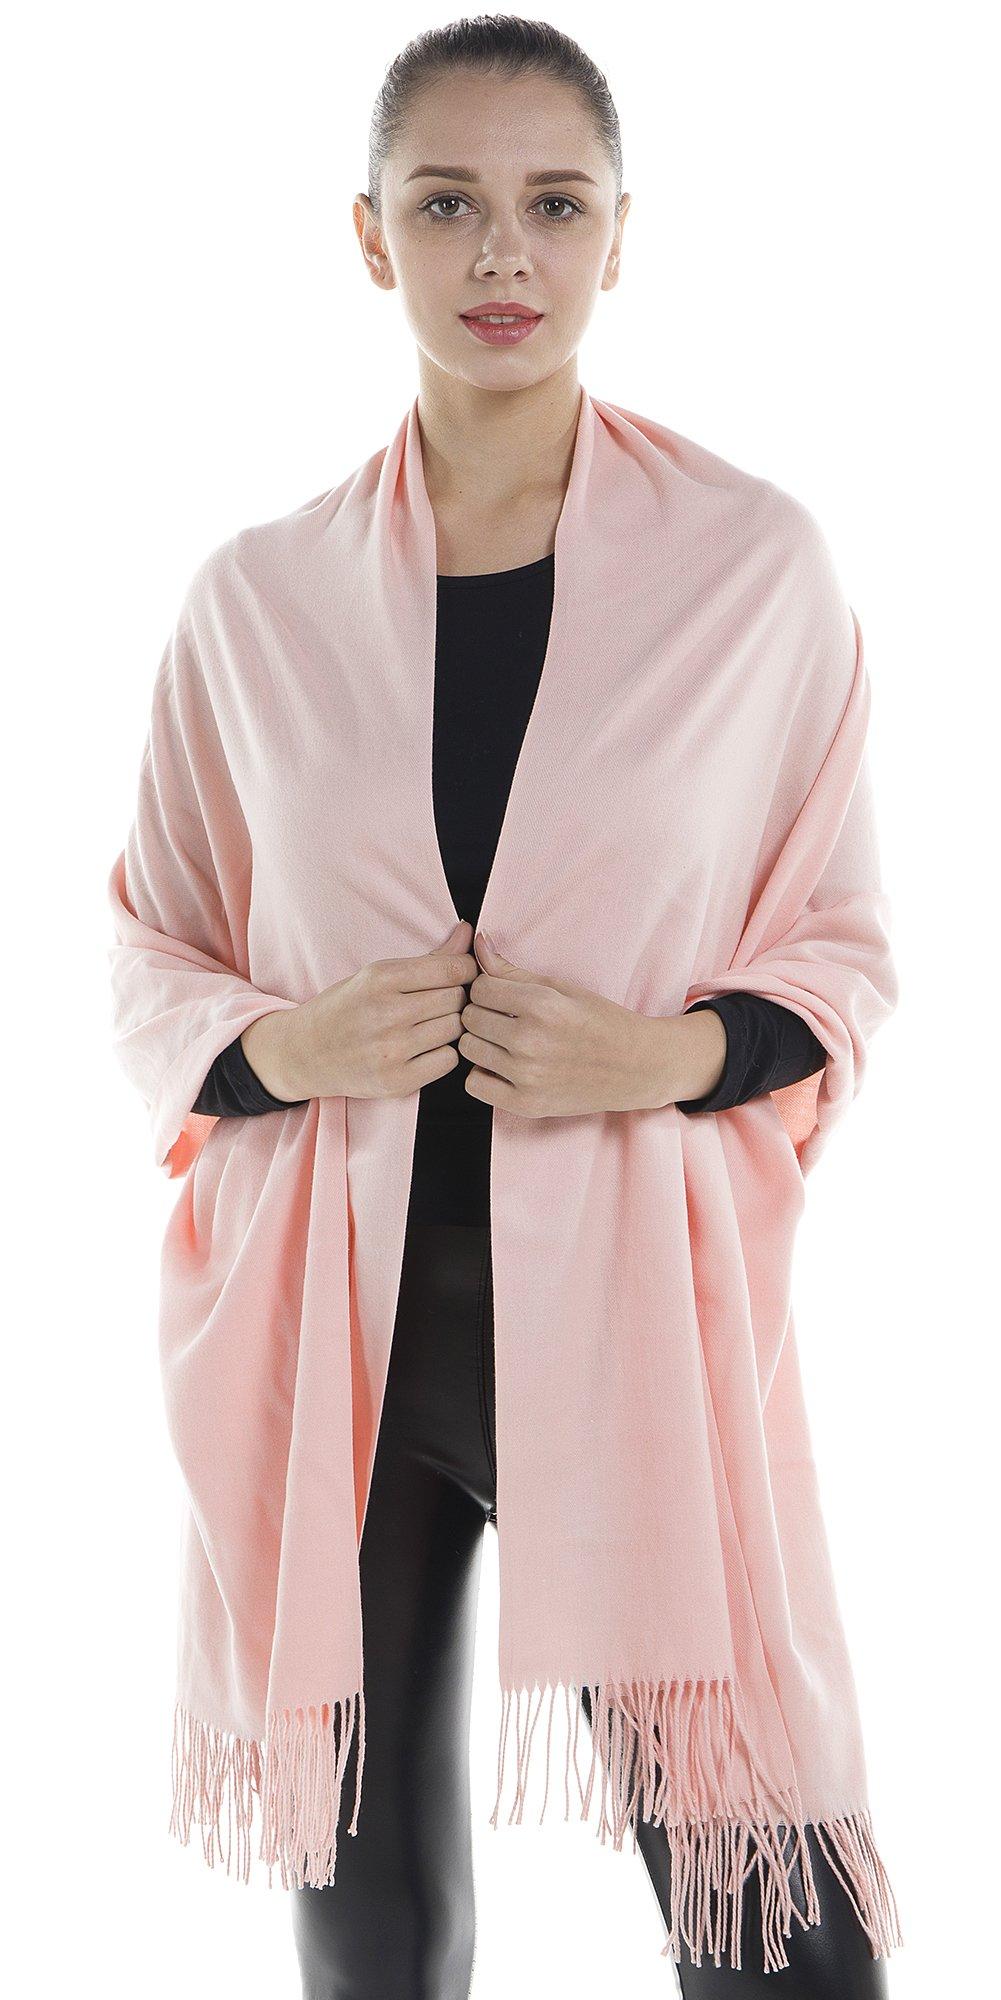 Niaiwei Women Scarf Plaid Blanket Scarves Wraps Shawl winter Cashemere scarf (Peach)